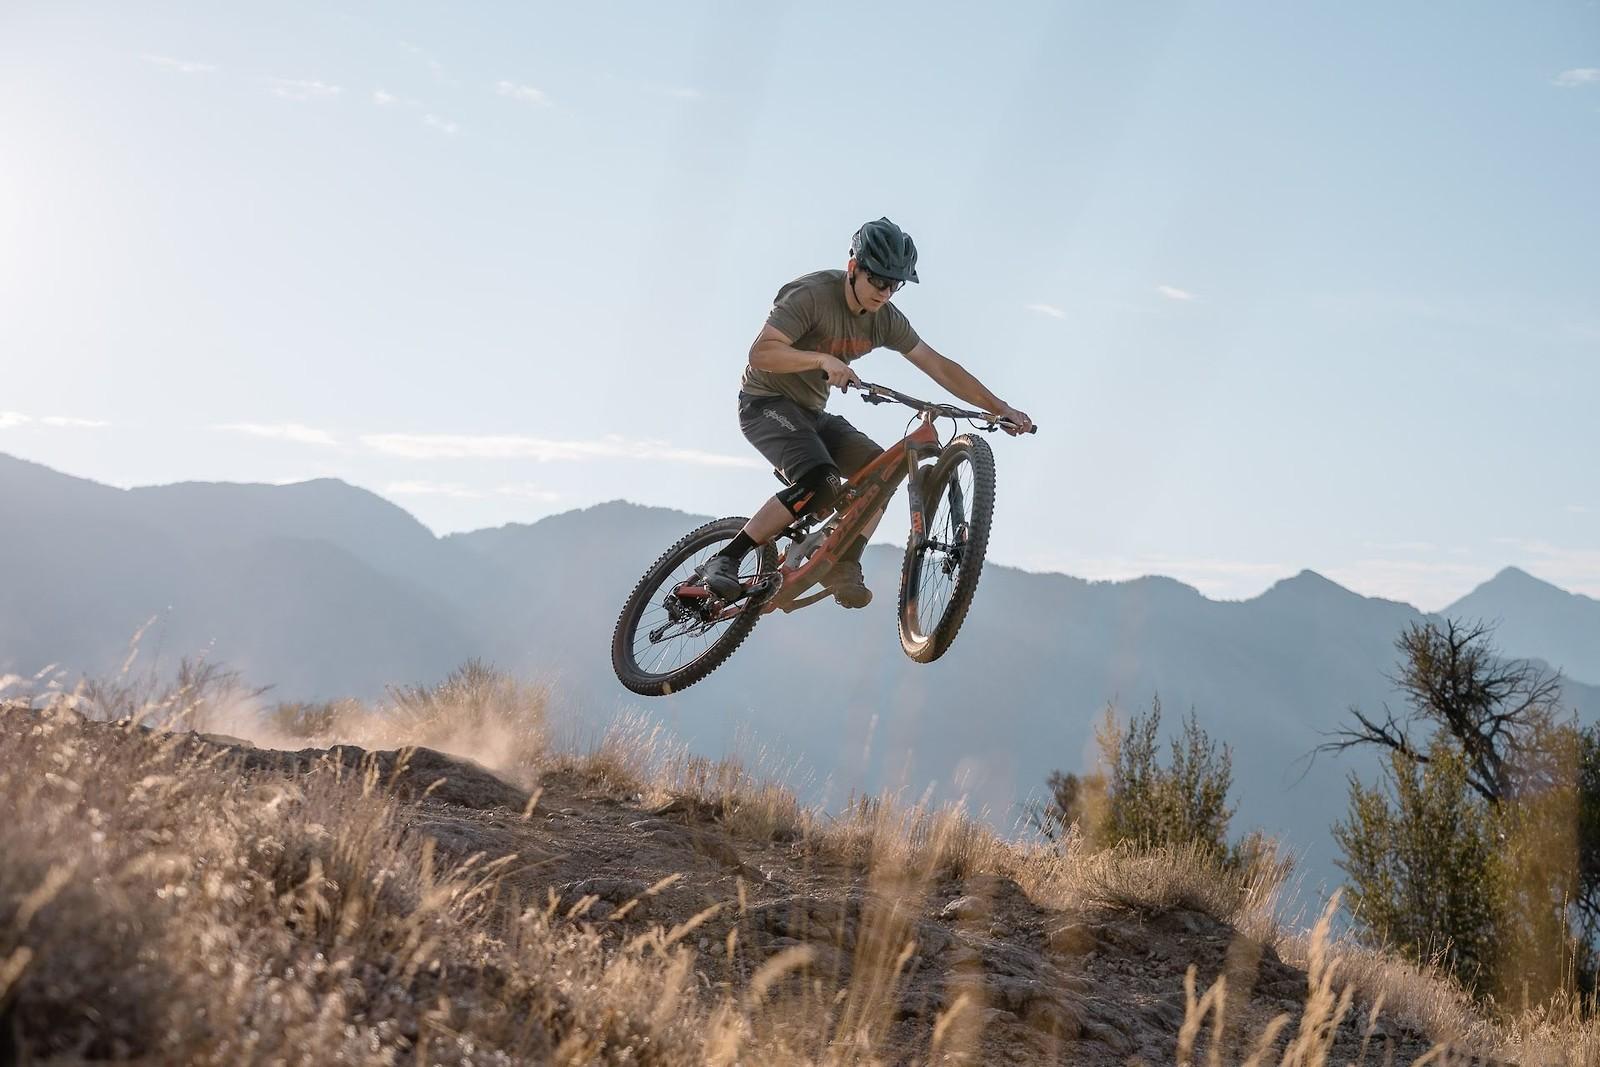 Jacob's Ladder - ninguno - Mountain Biking Pictures - Vital MTB